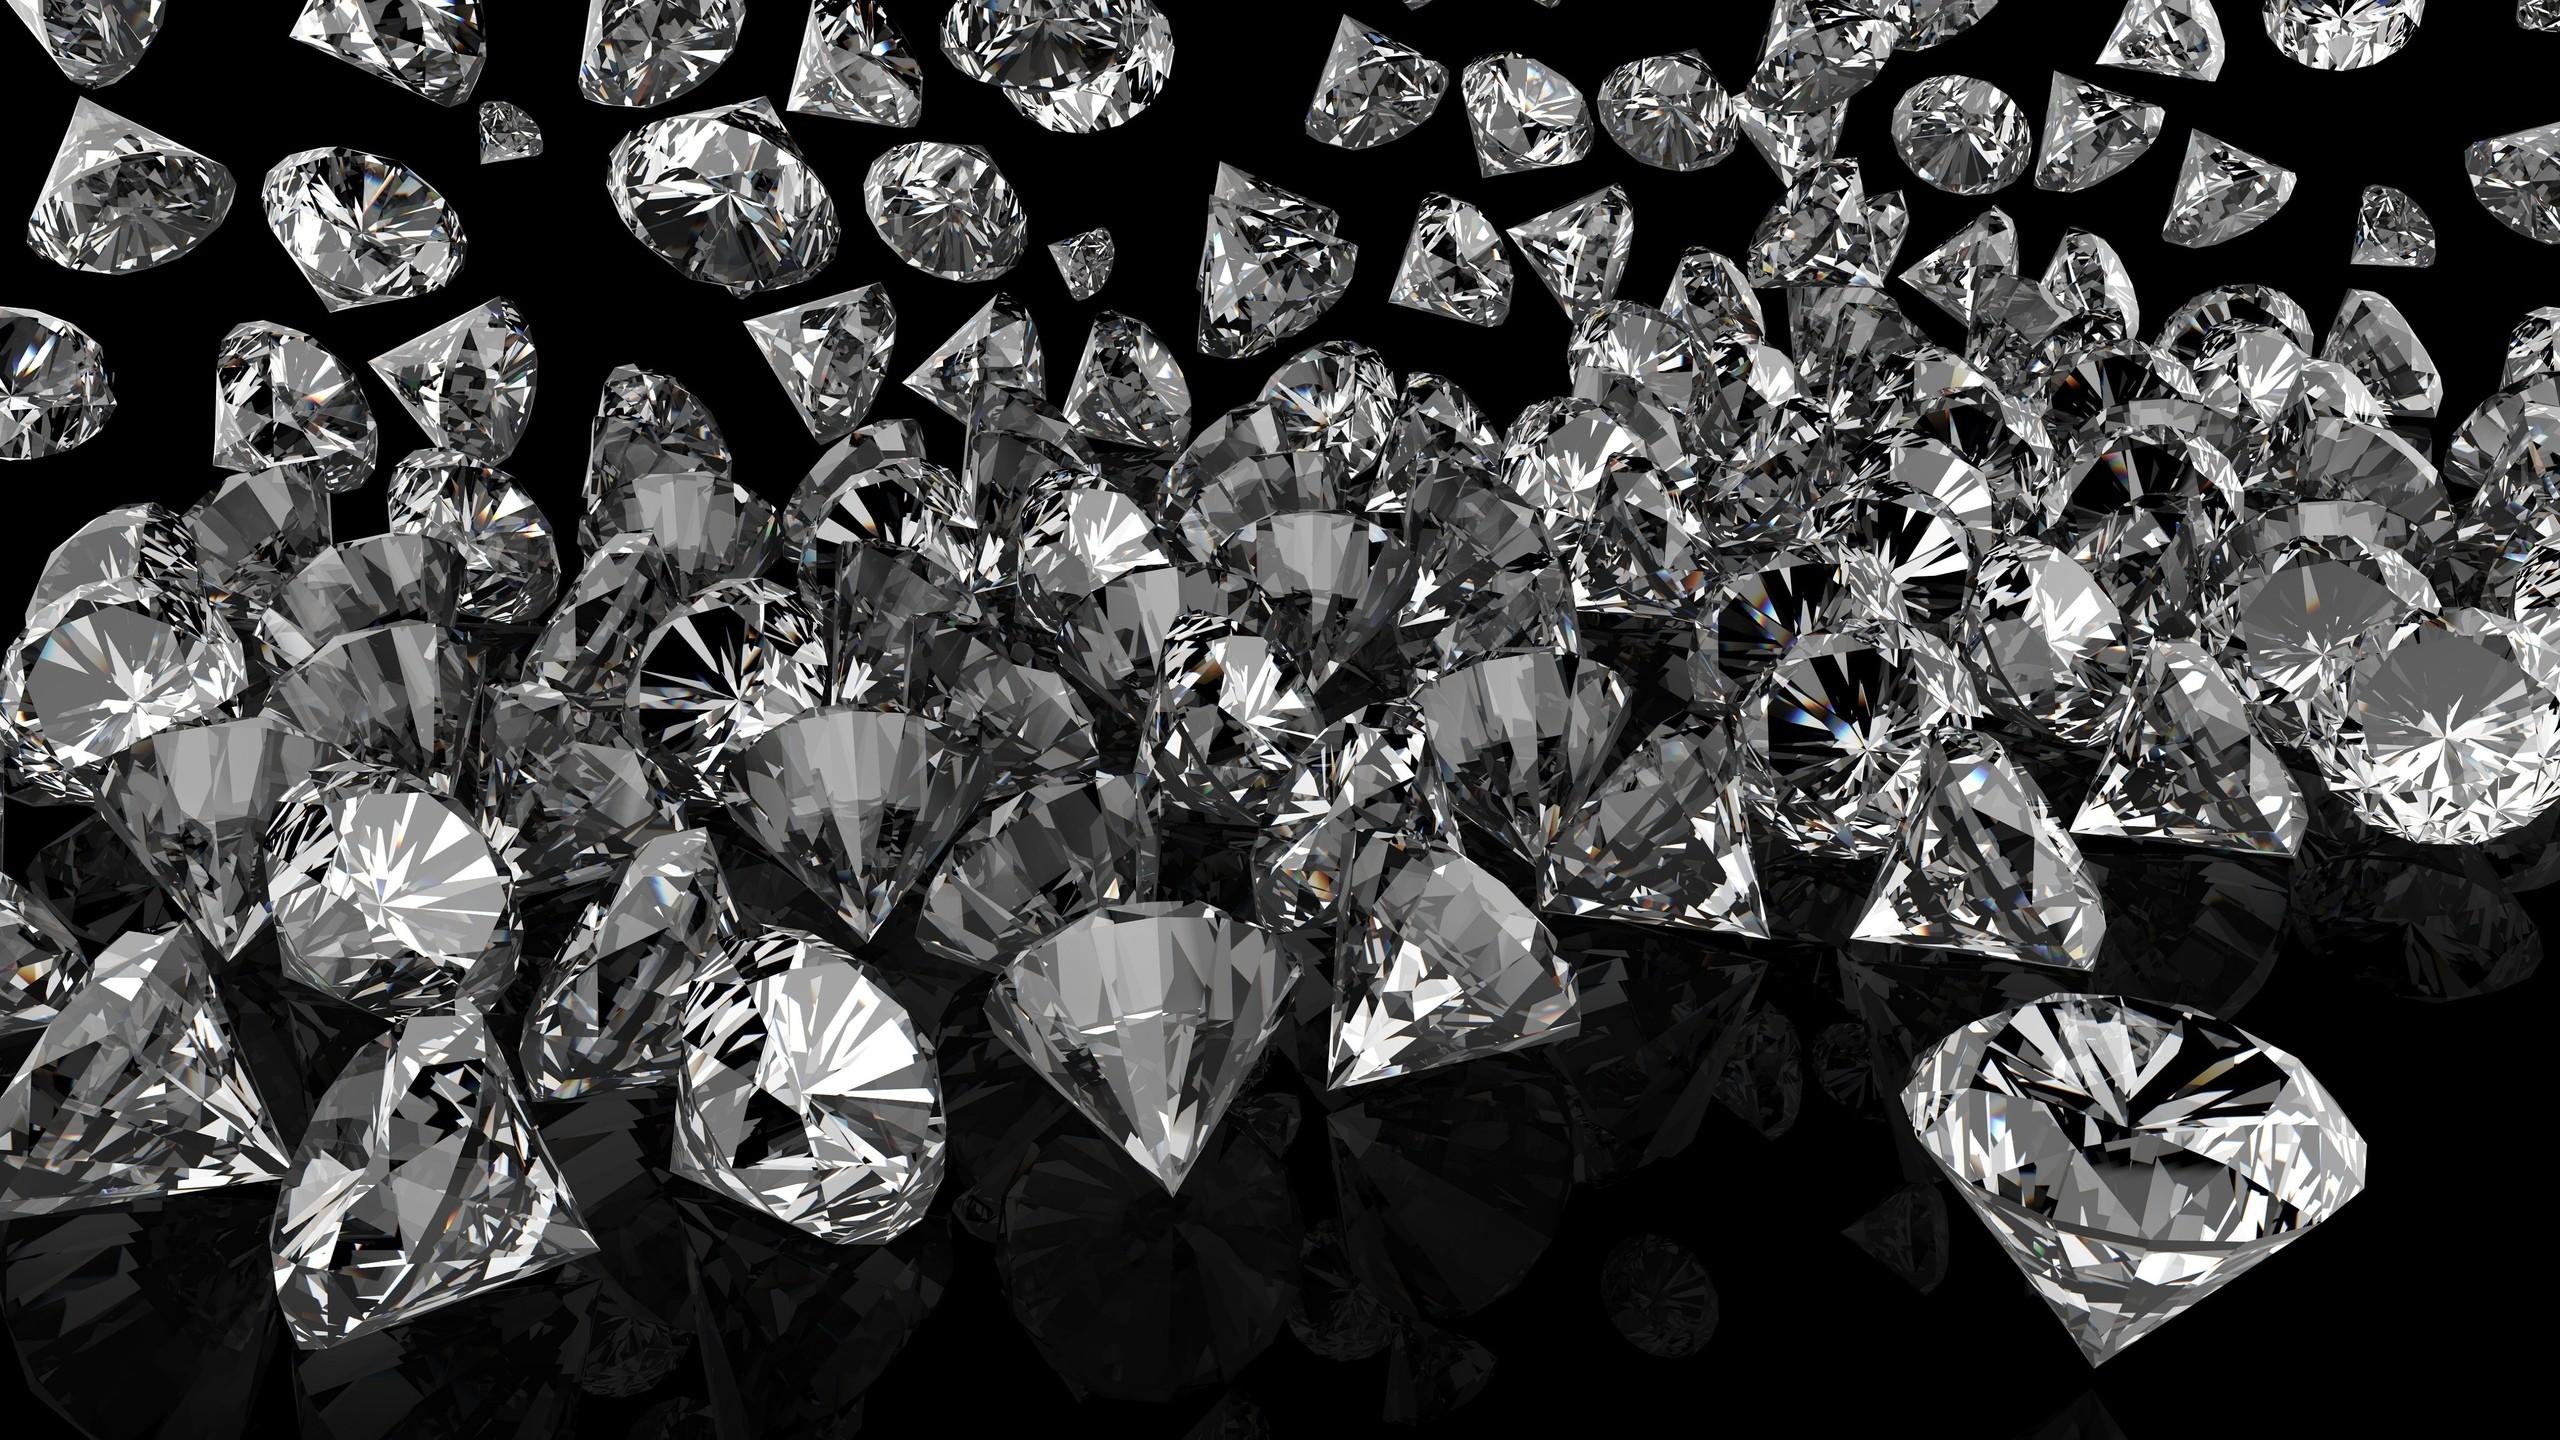 Res: 2560x1440, Black Diamonds Desktop Background Mobile Wallpaper Hd Pics Of Laptop Diamond  Backgrounds